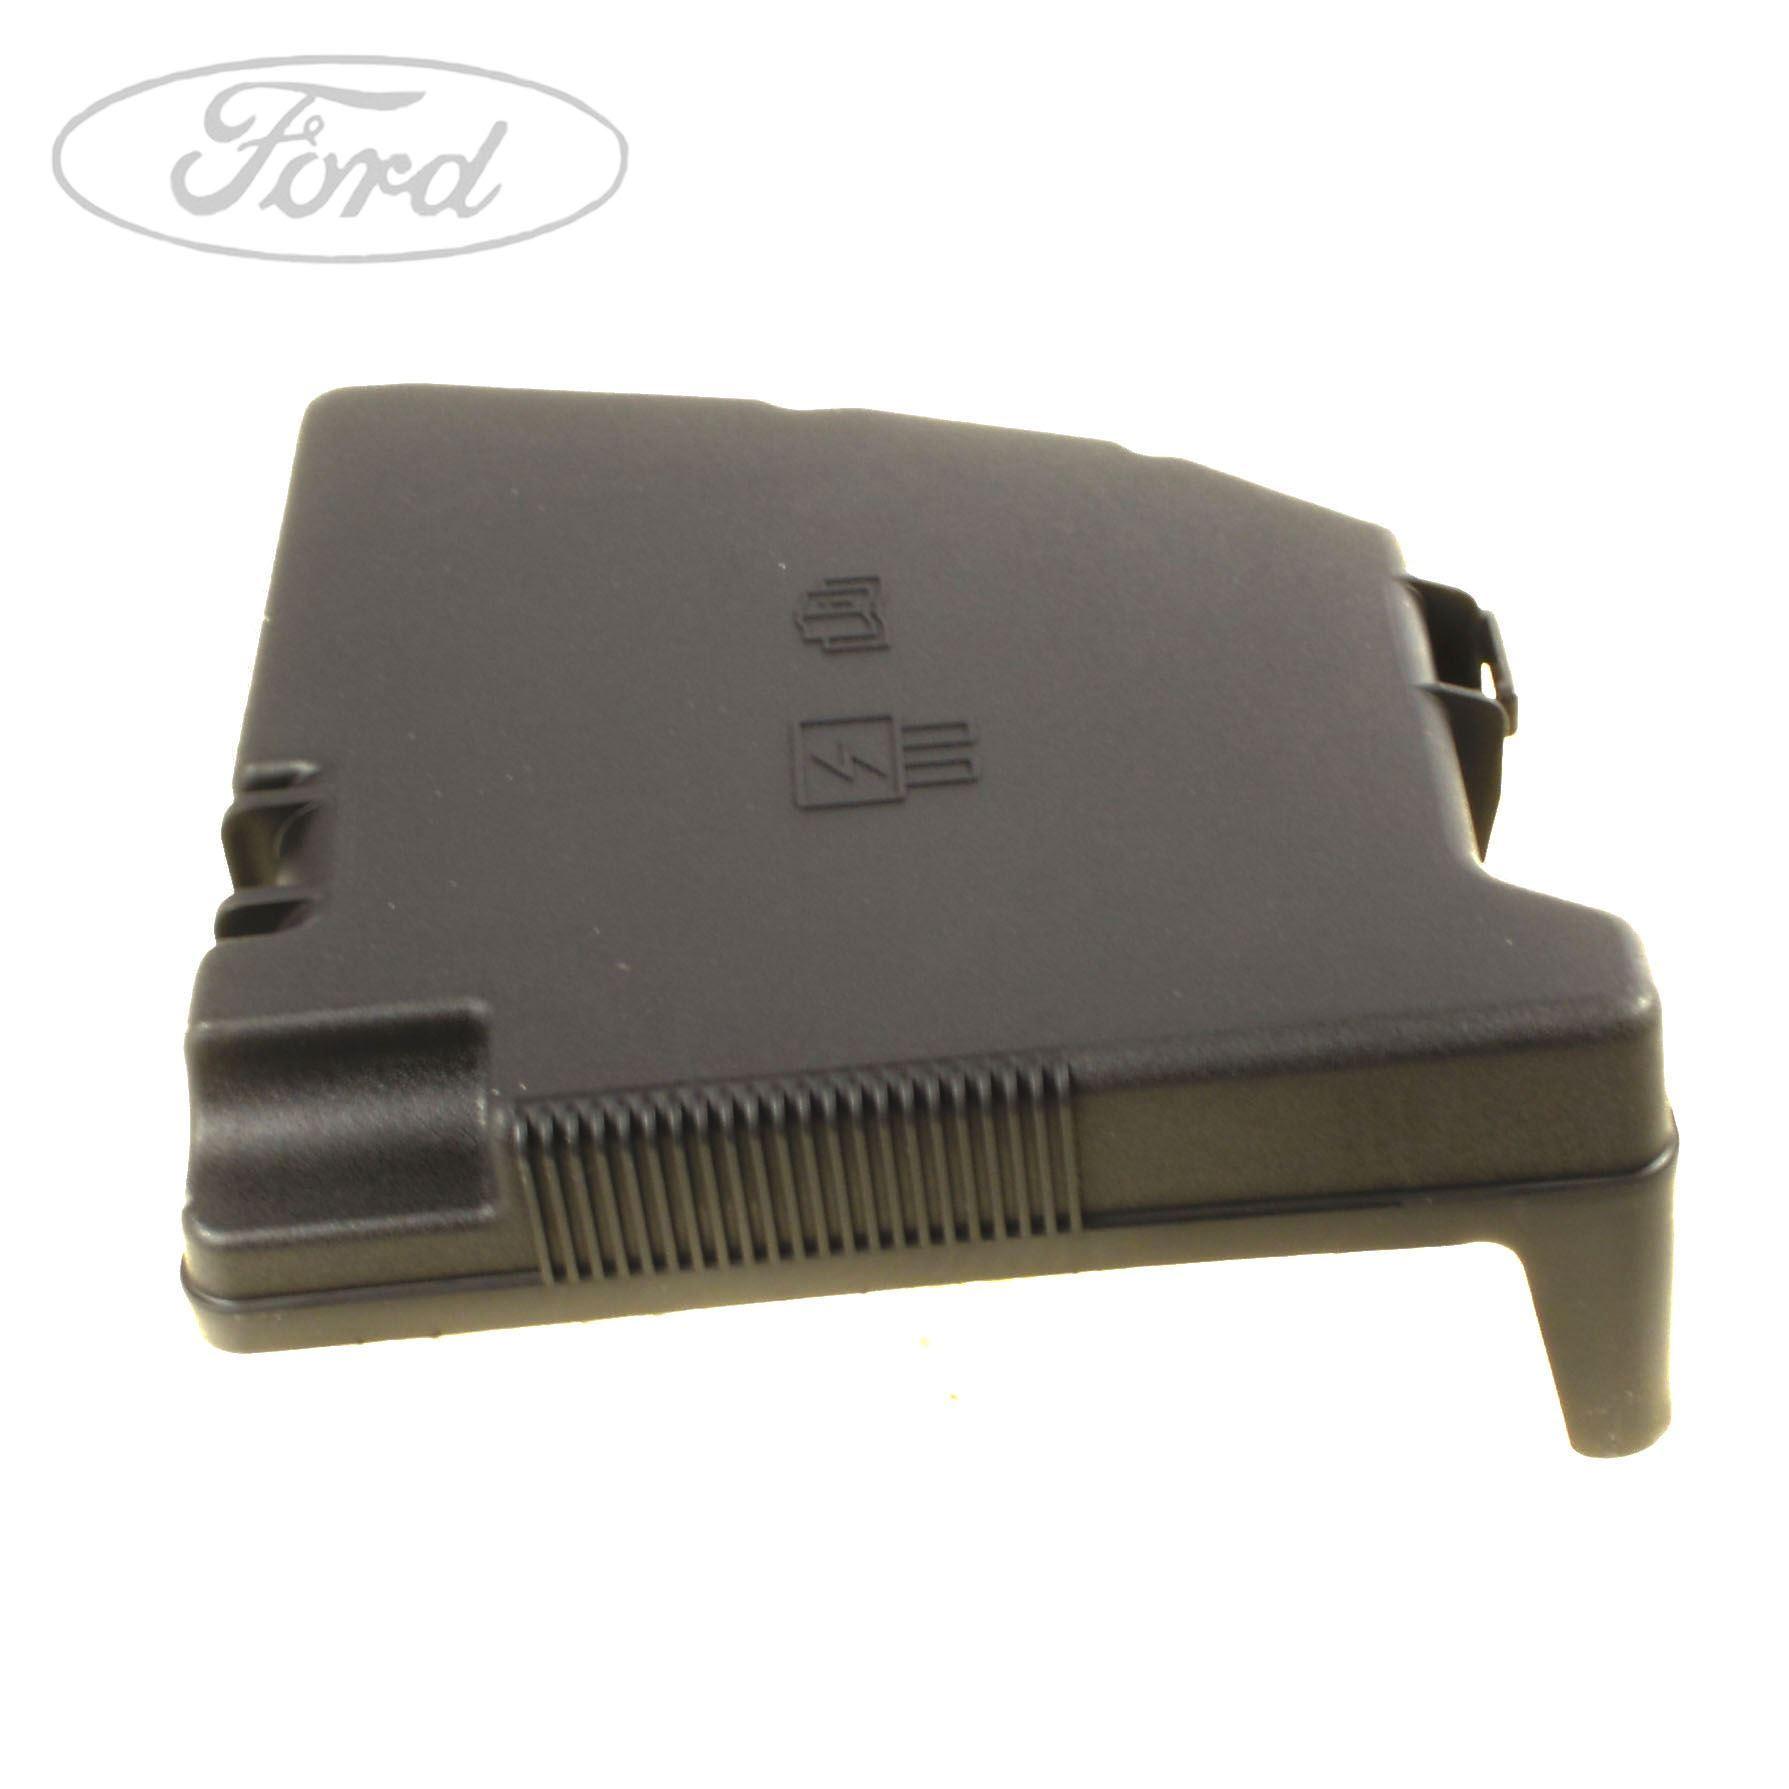 Genuine Ford Fiesta Mk7 Fuse Box Cover 1515045 Ebay On 2006